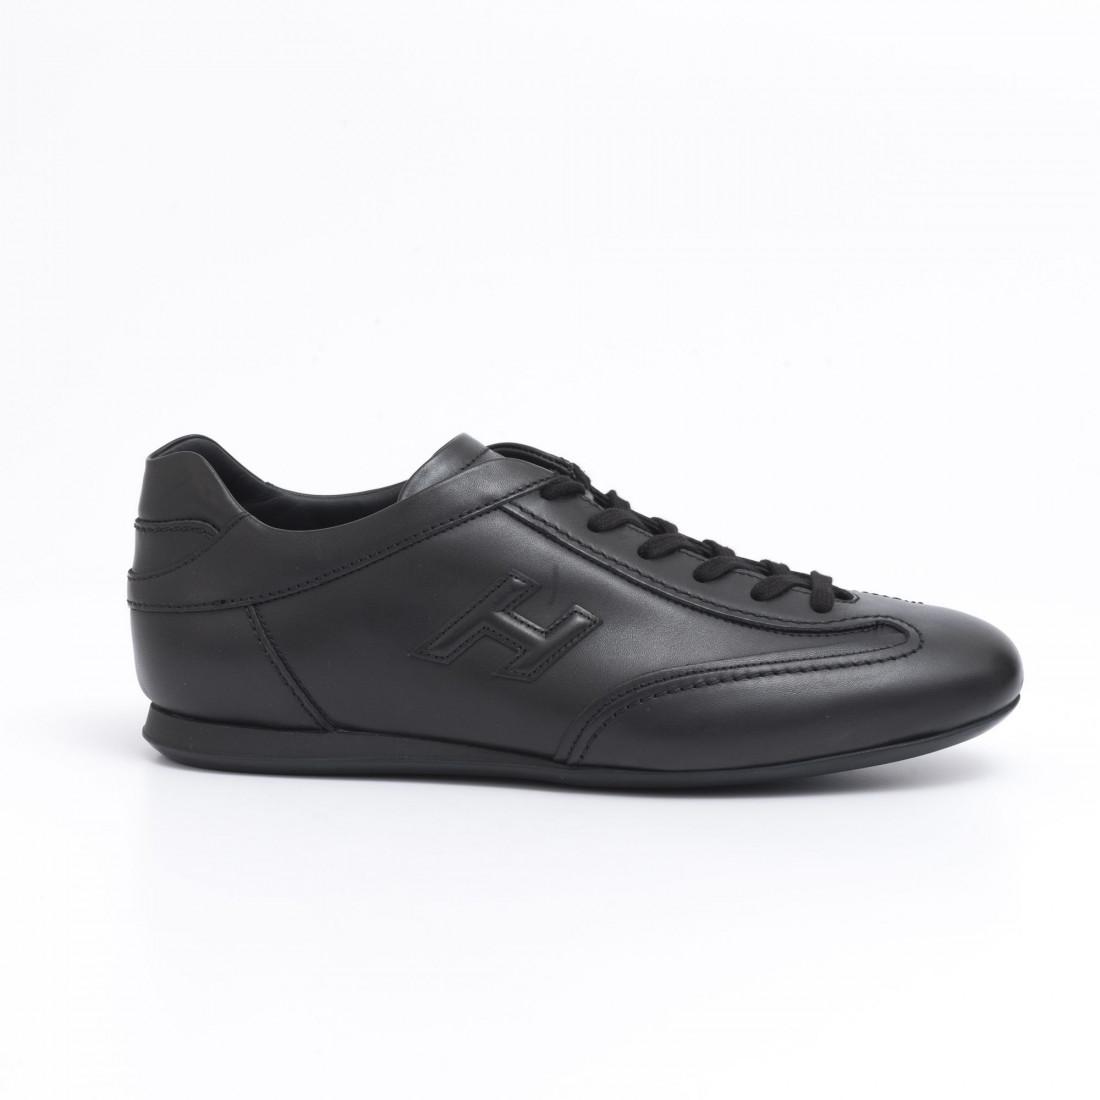 sneakers man hogan hxm0570i9721pob999 2450